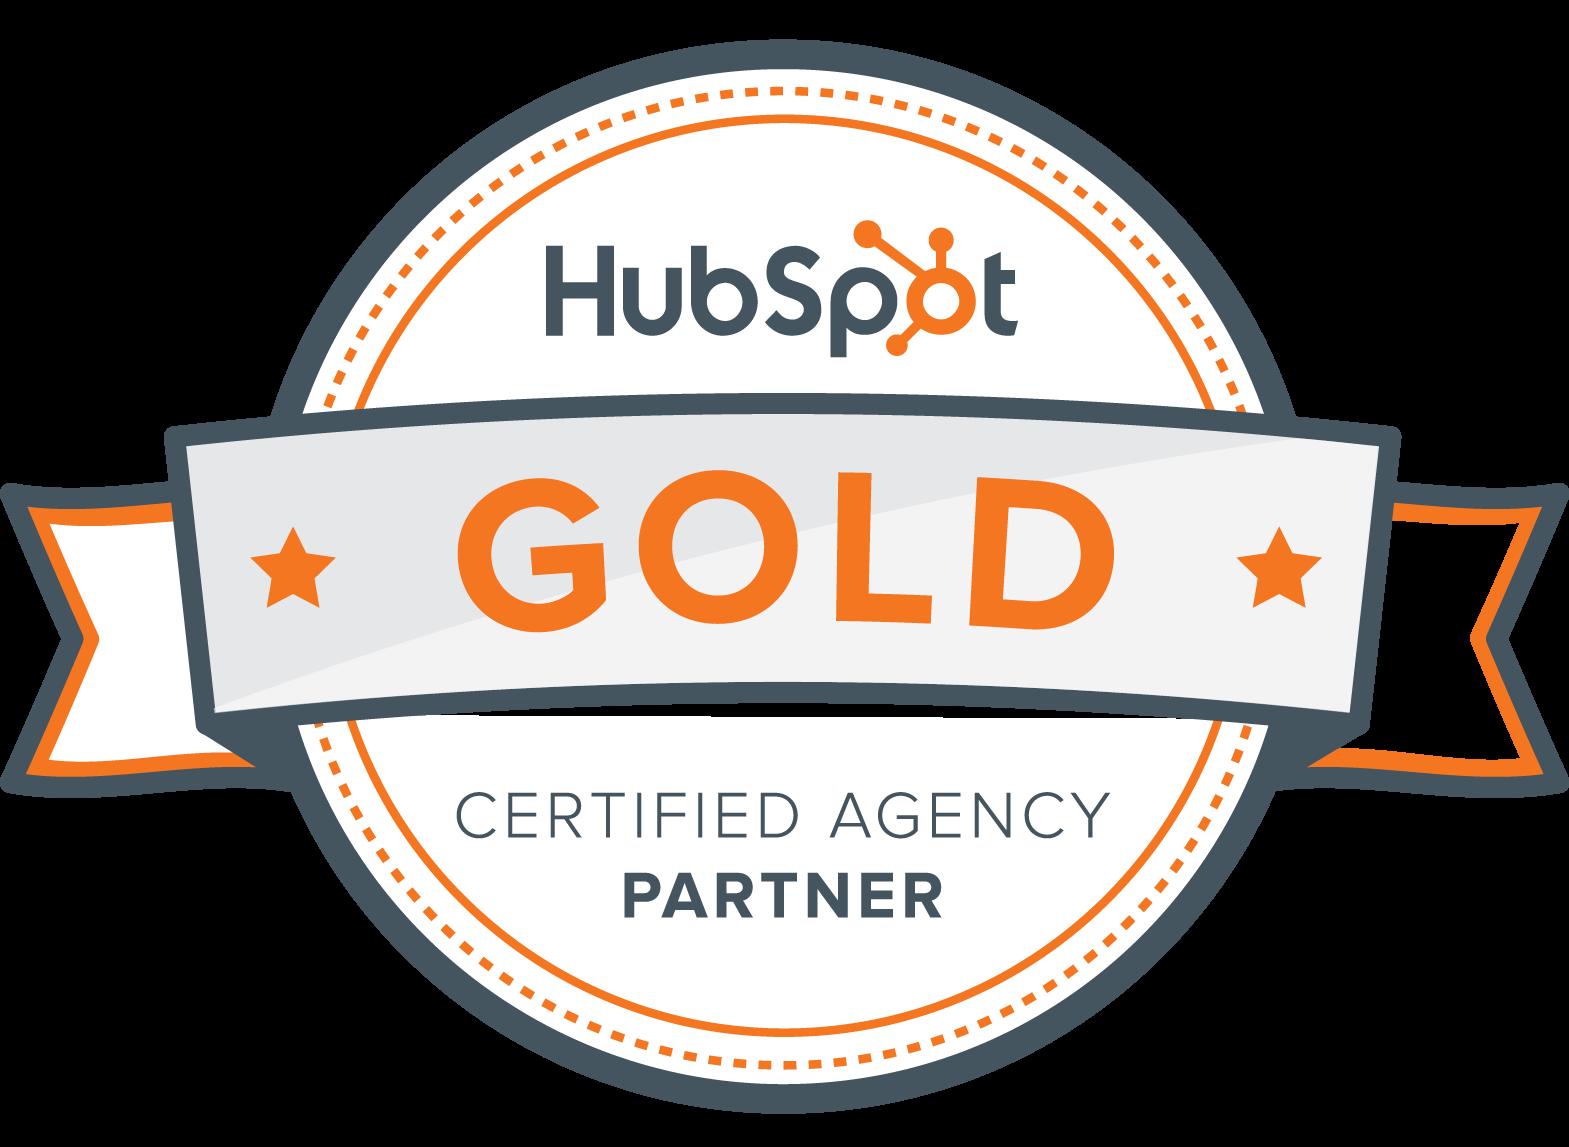 Sneakerlost Gold Partner Hubspot